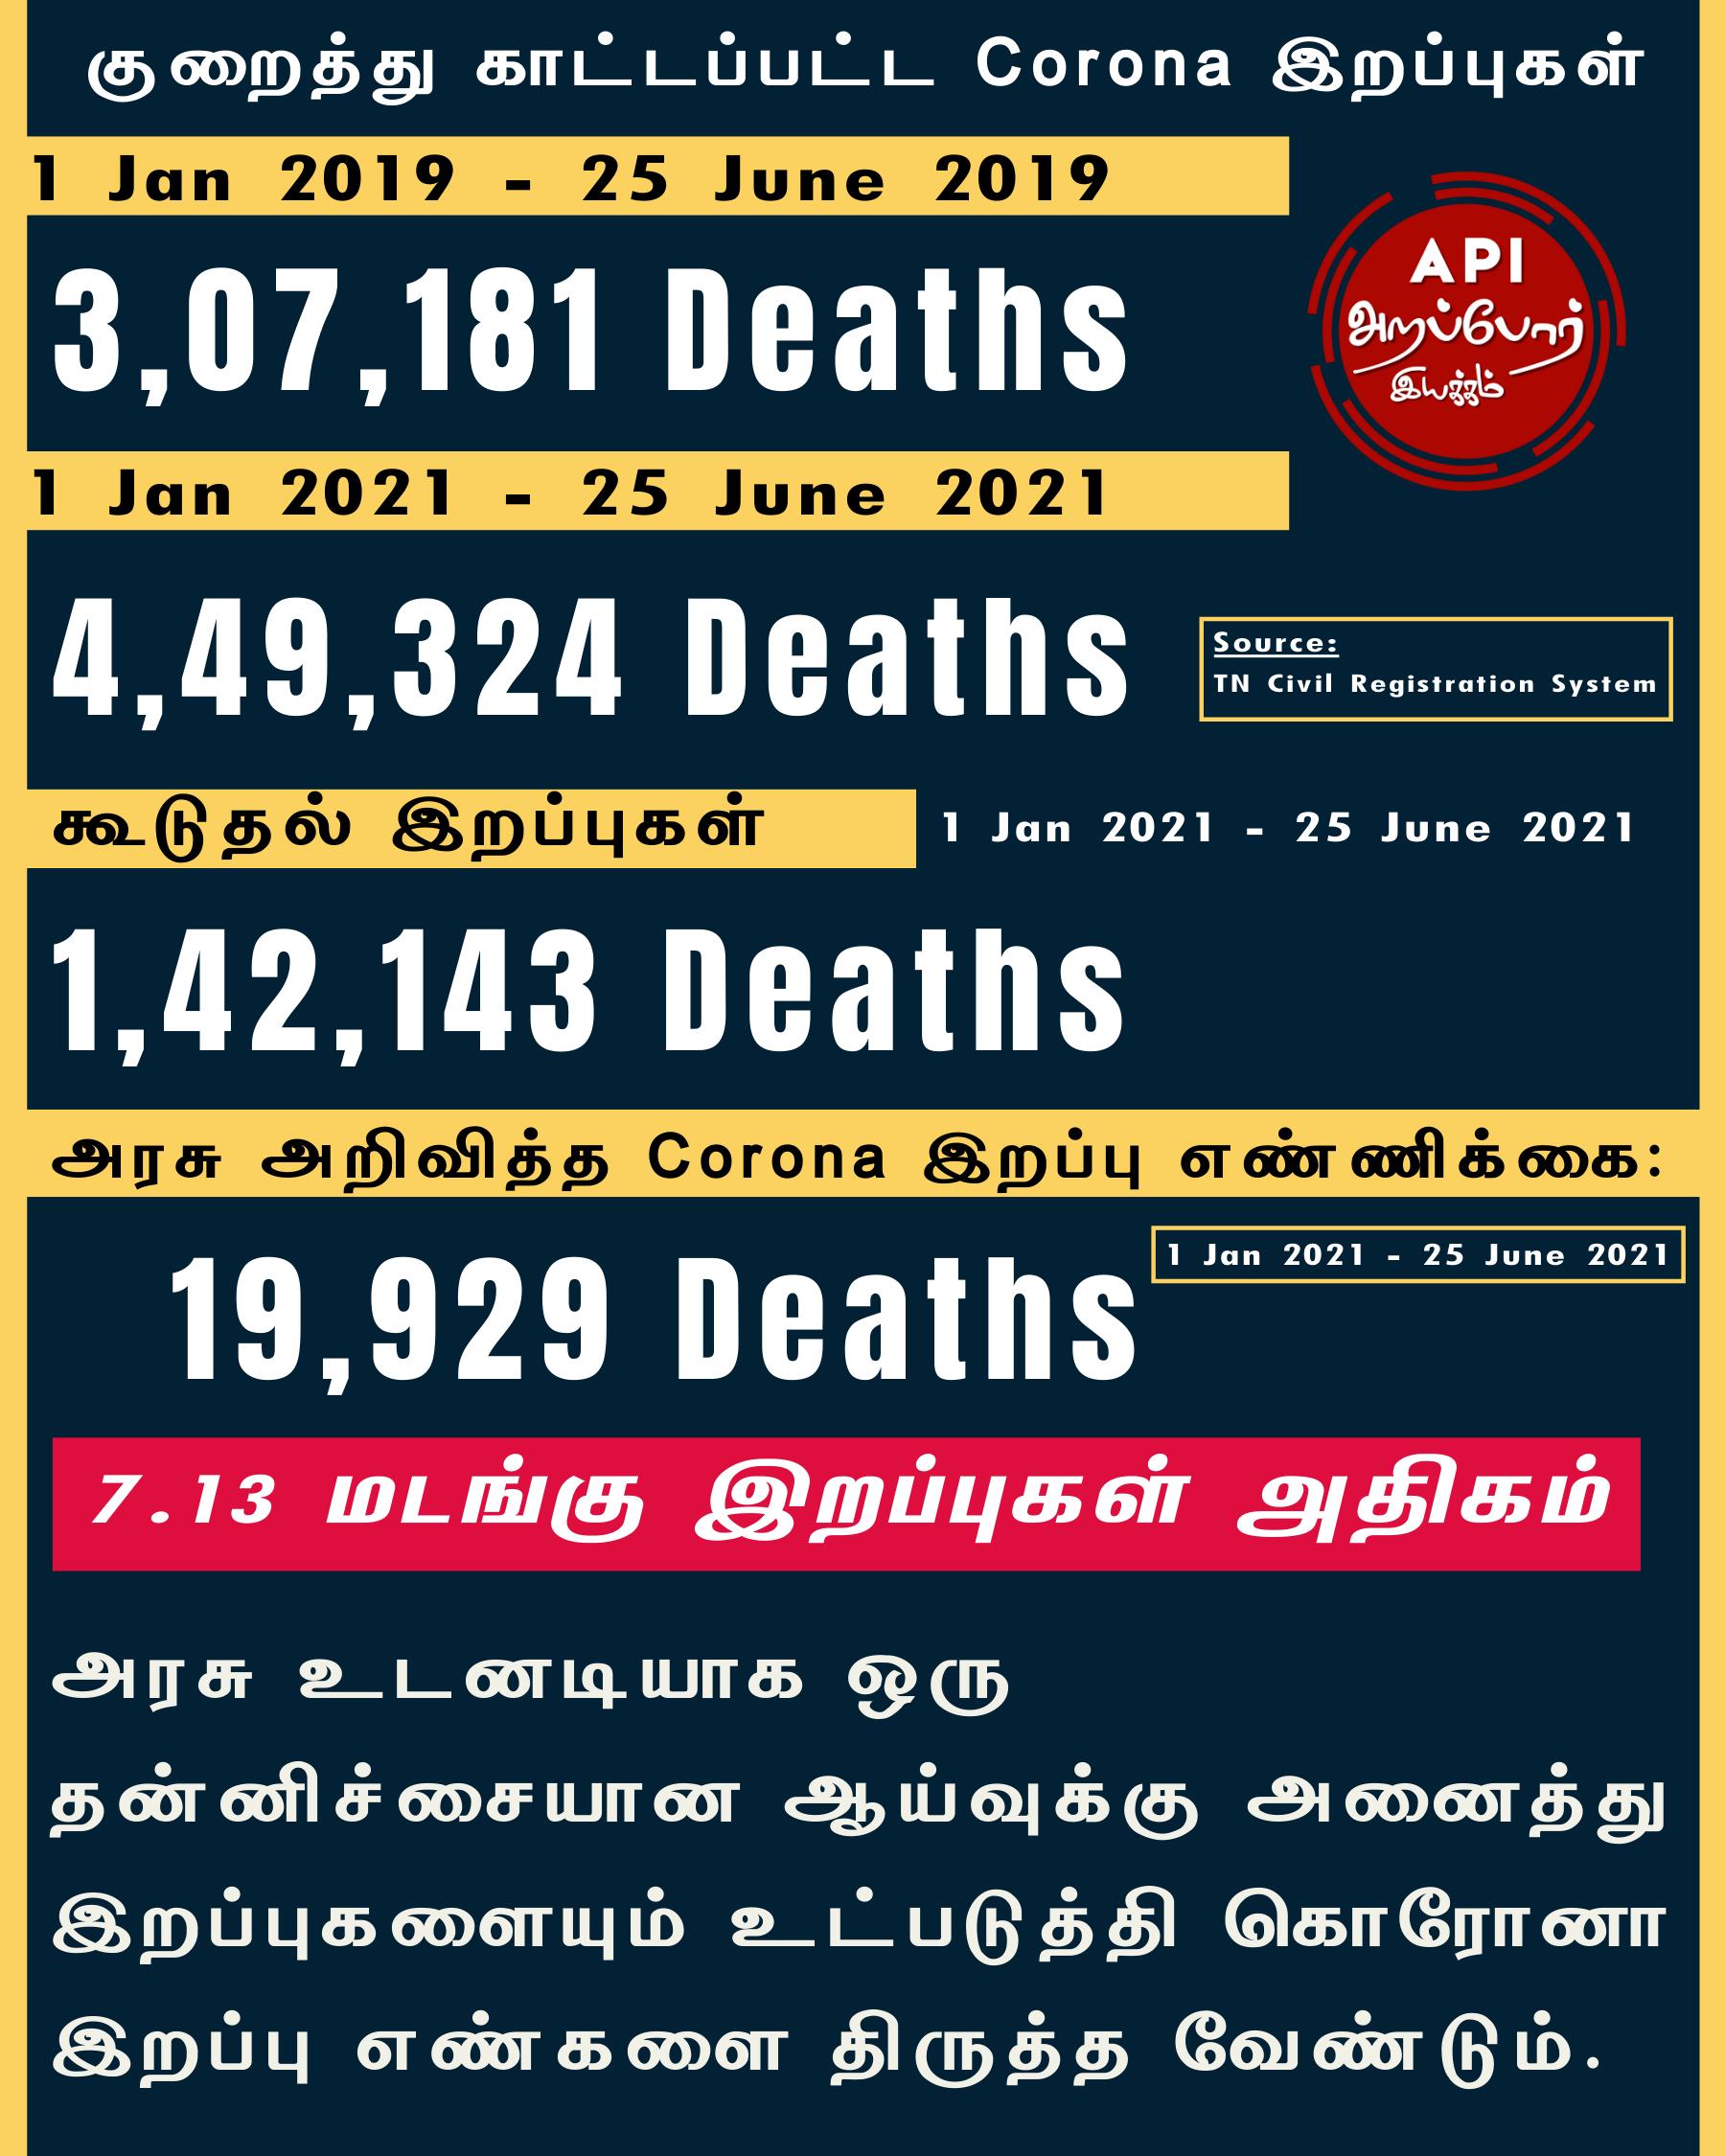 7 Times more Covid Deaths than TN govt announced